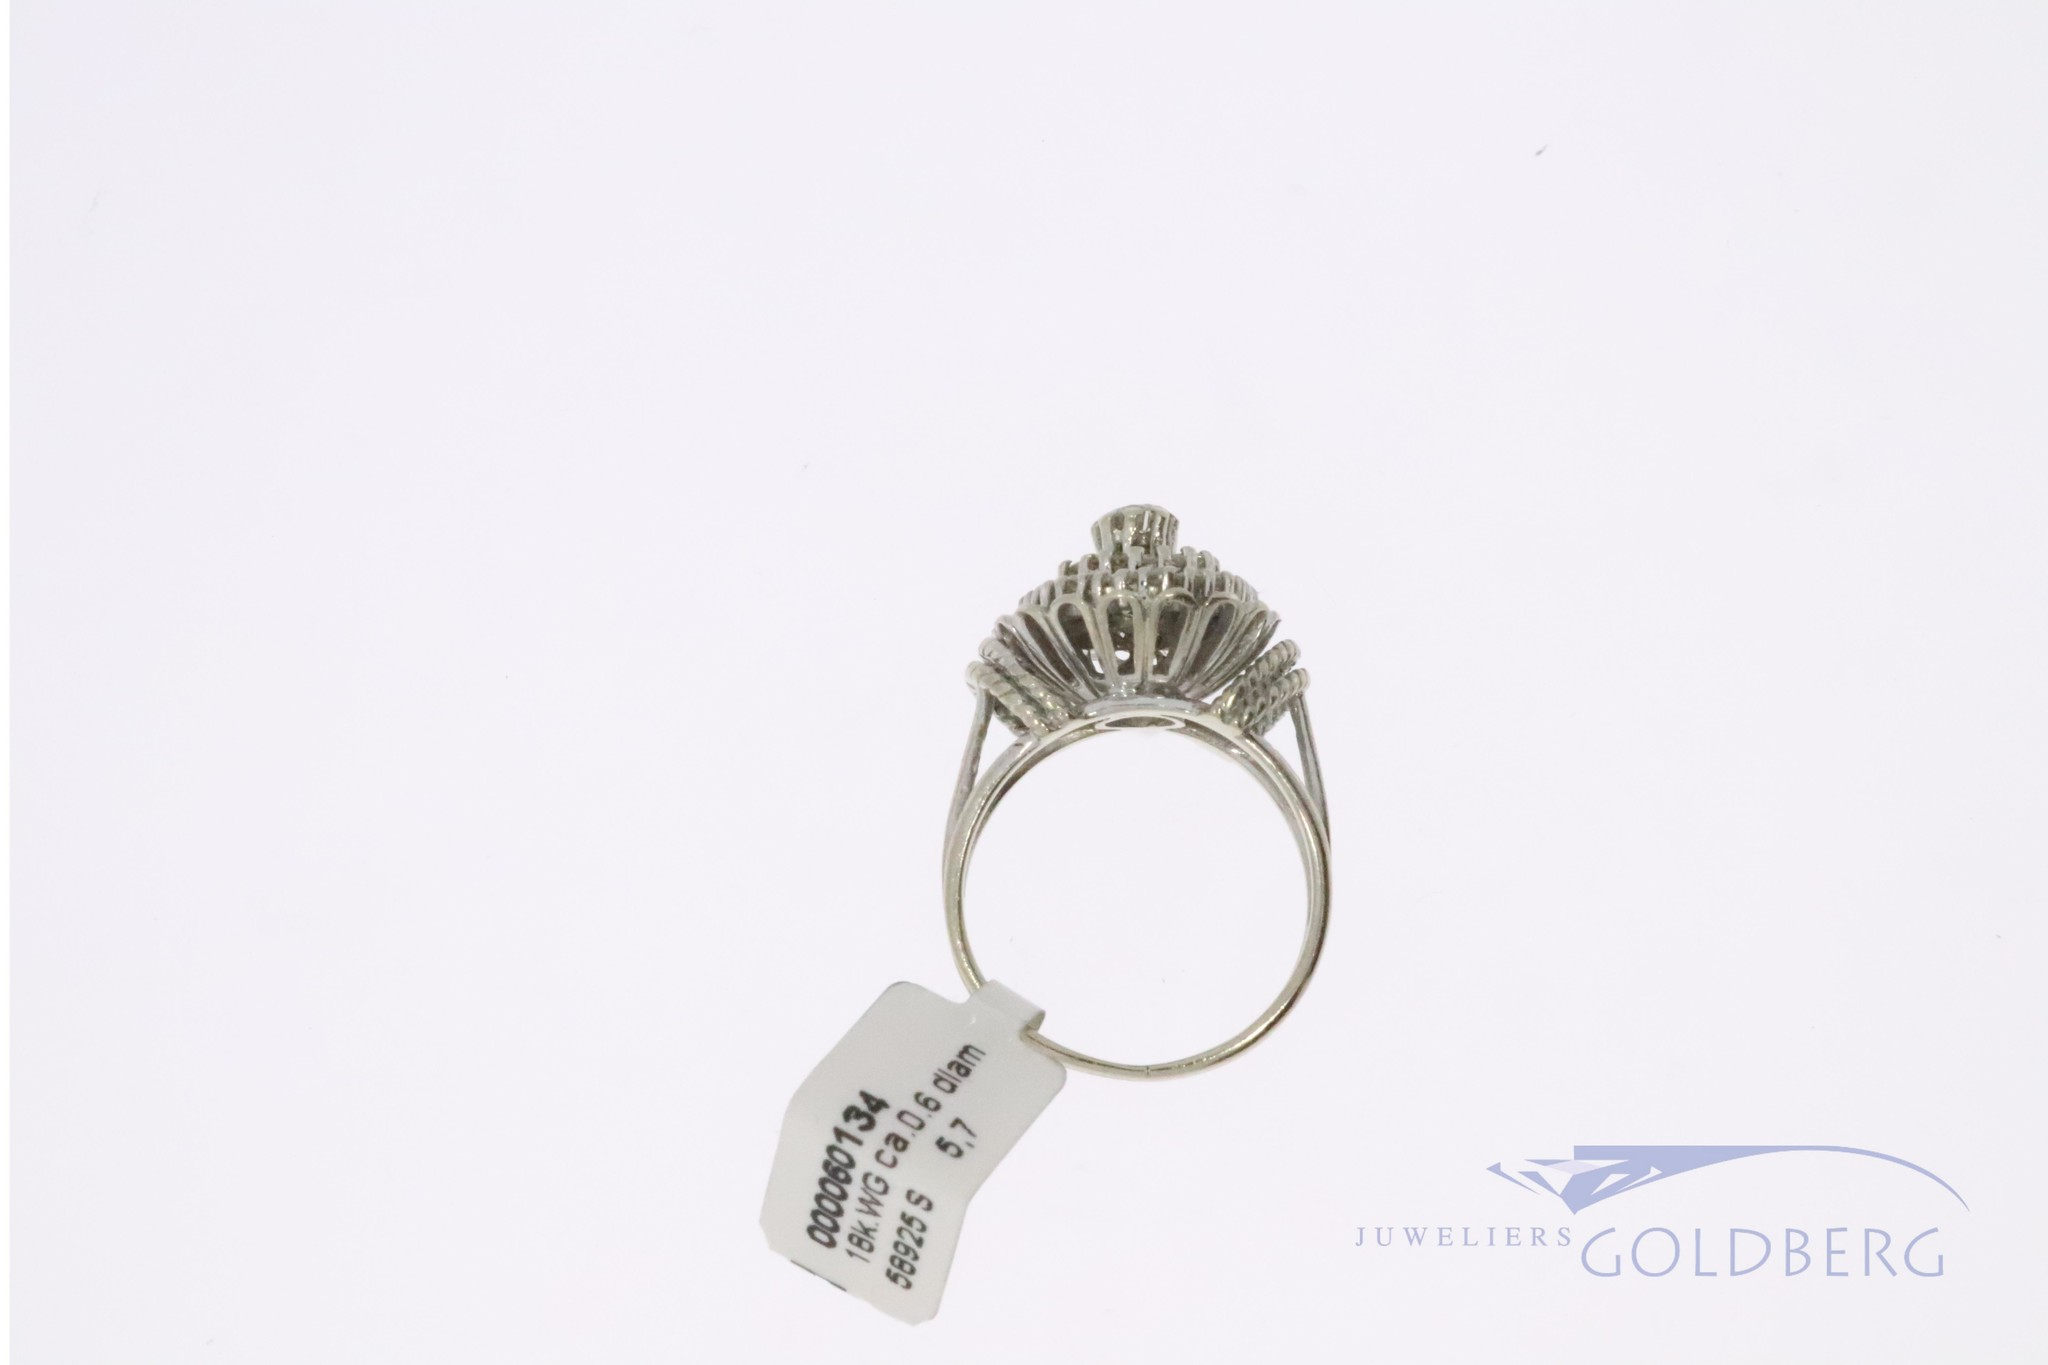 white gold vintage 18k rosette ring with diamonds